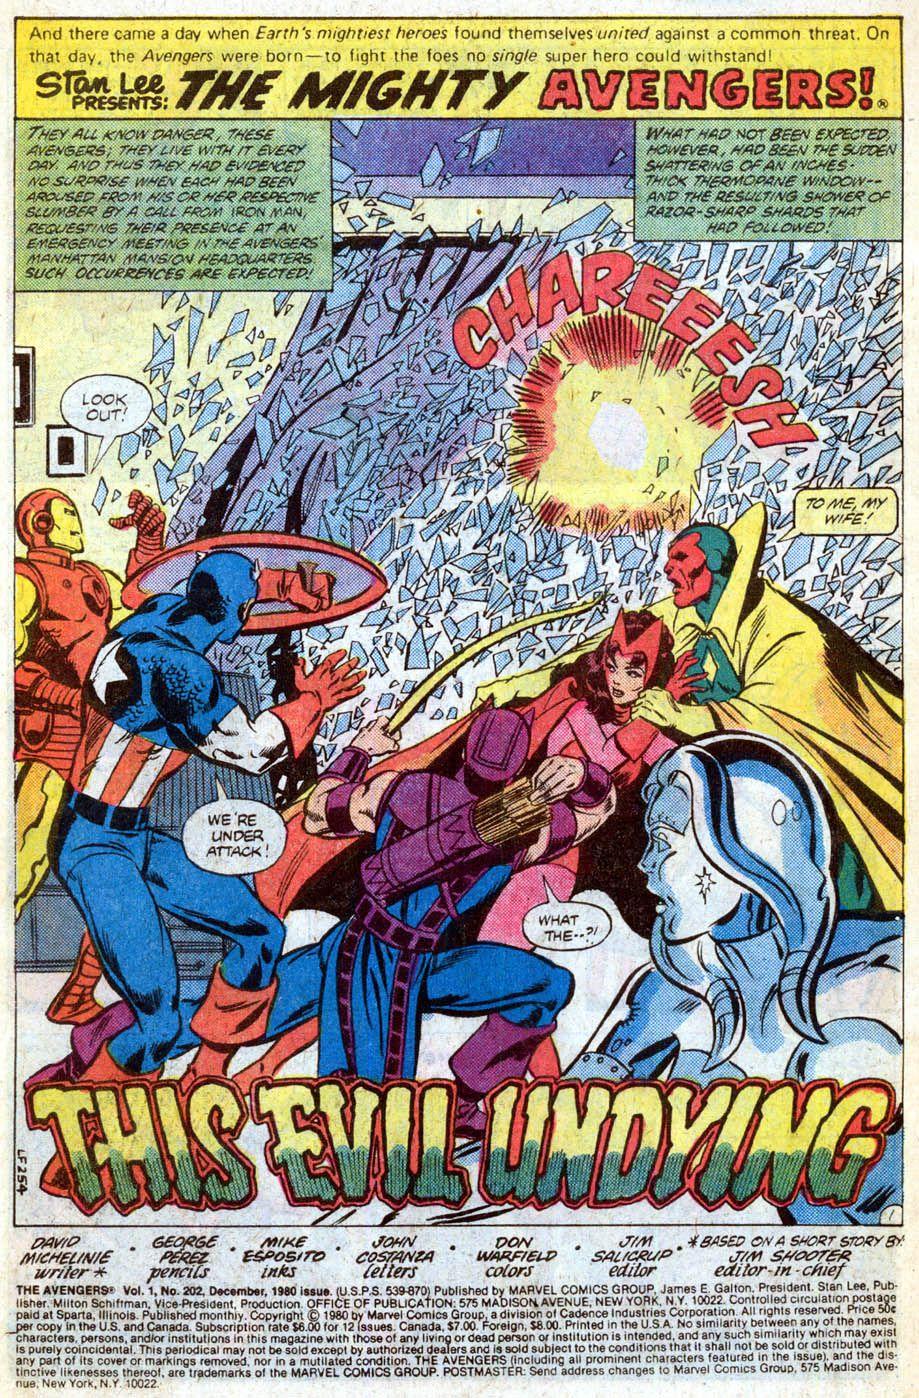 Avengers No. 202